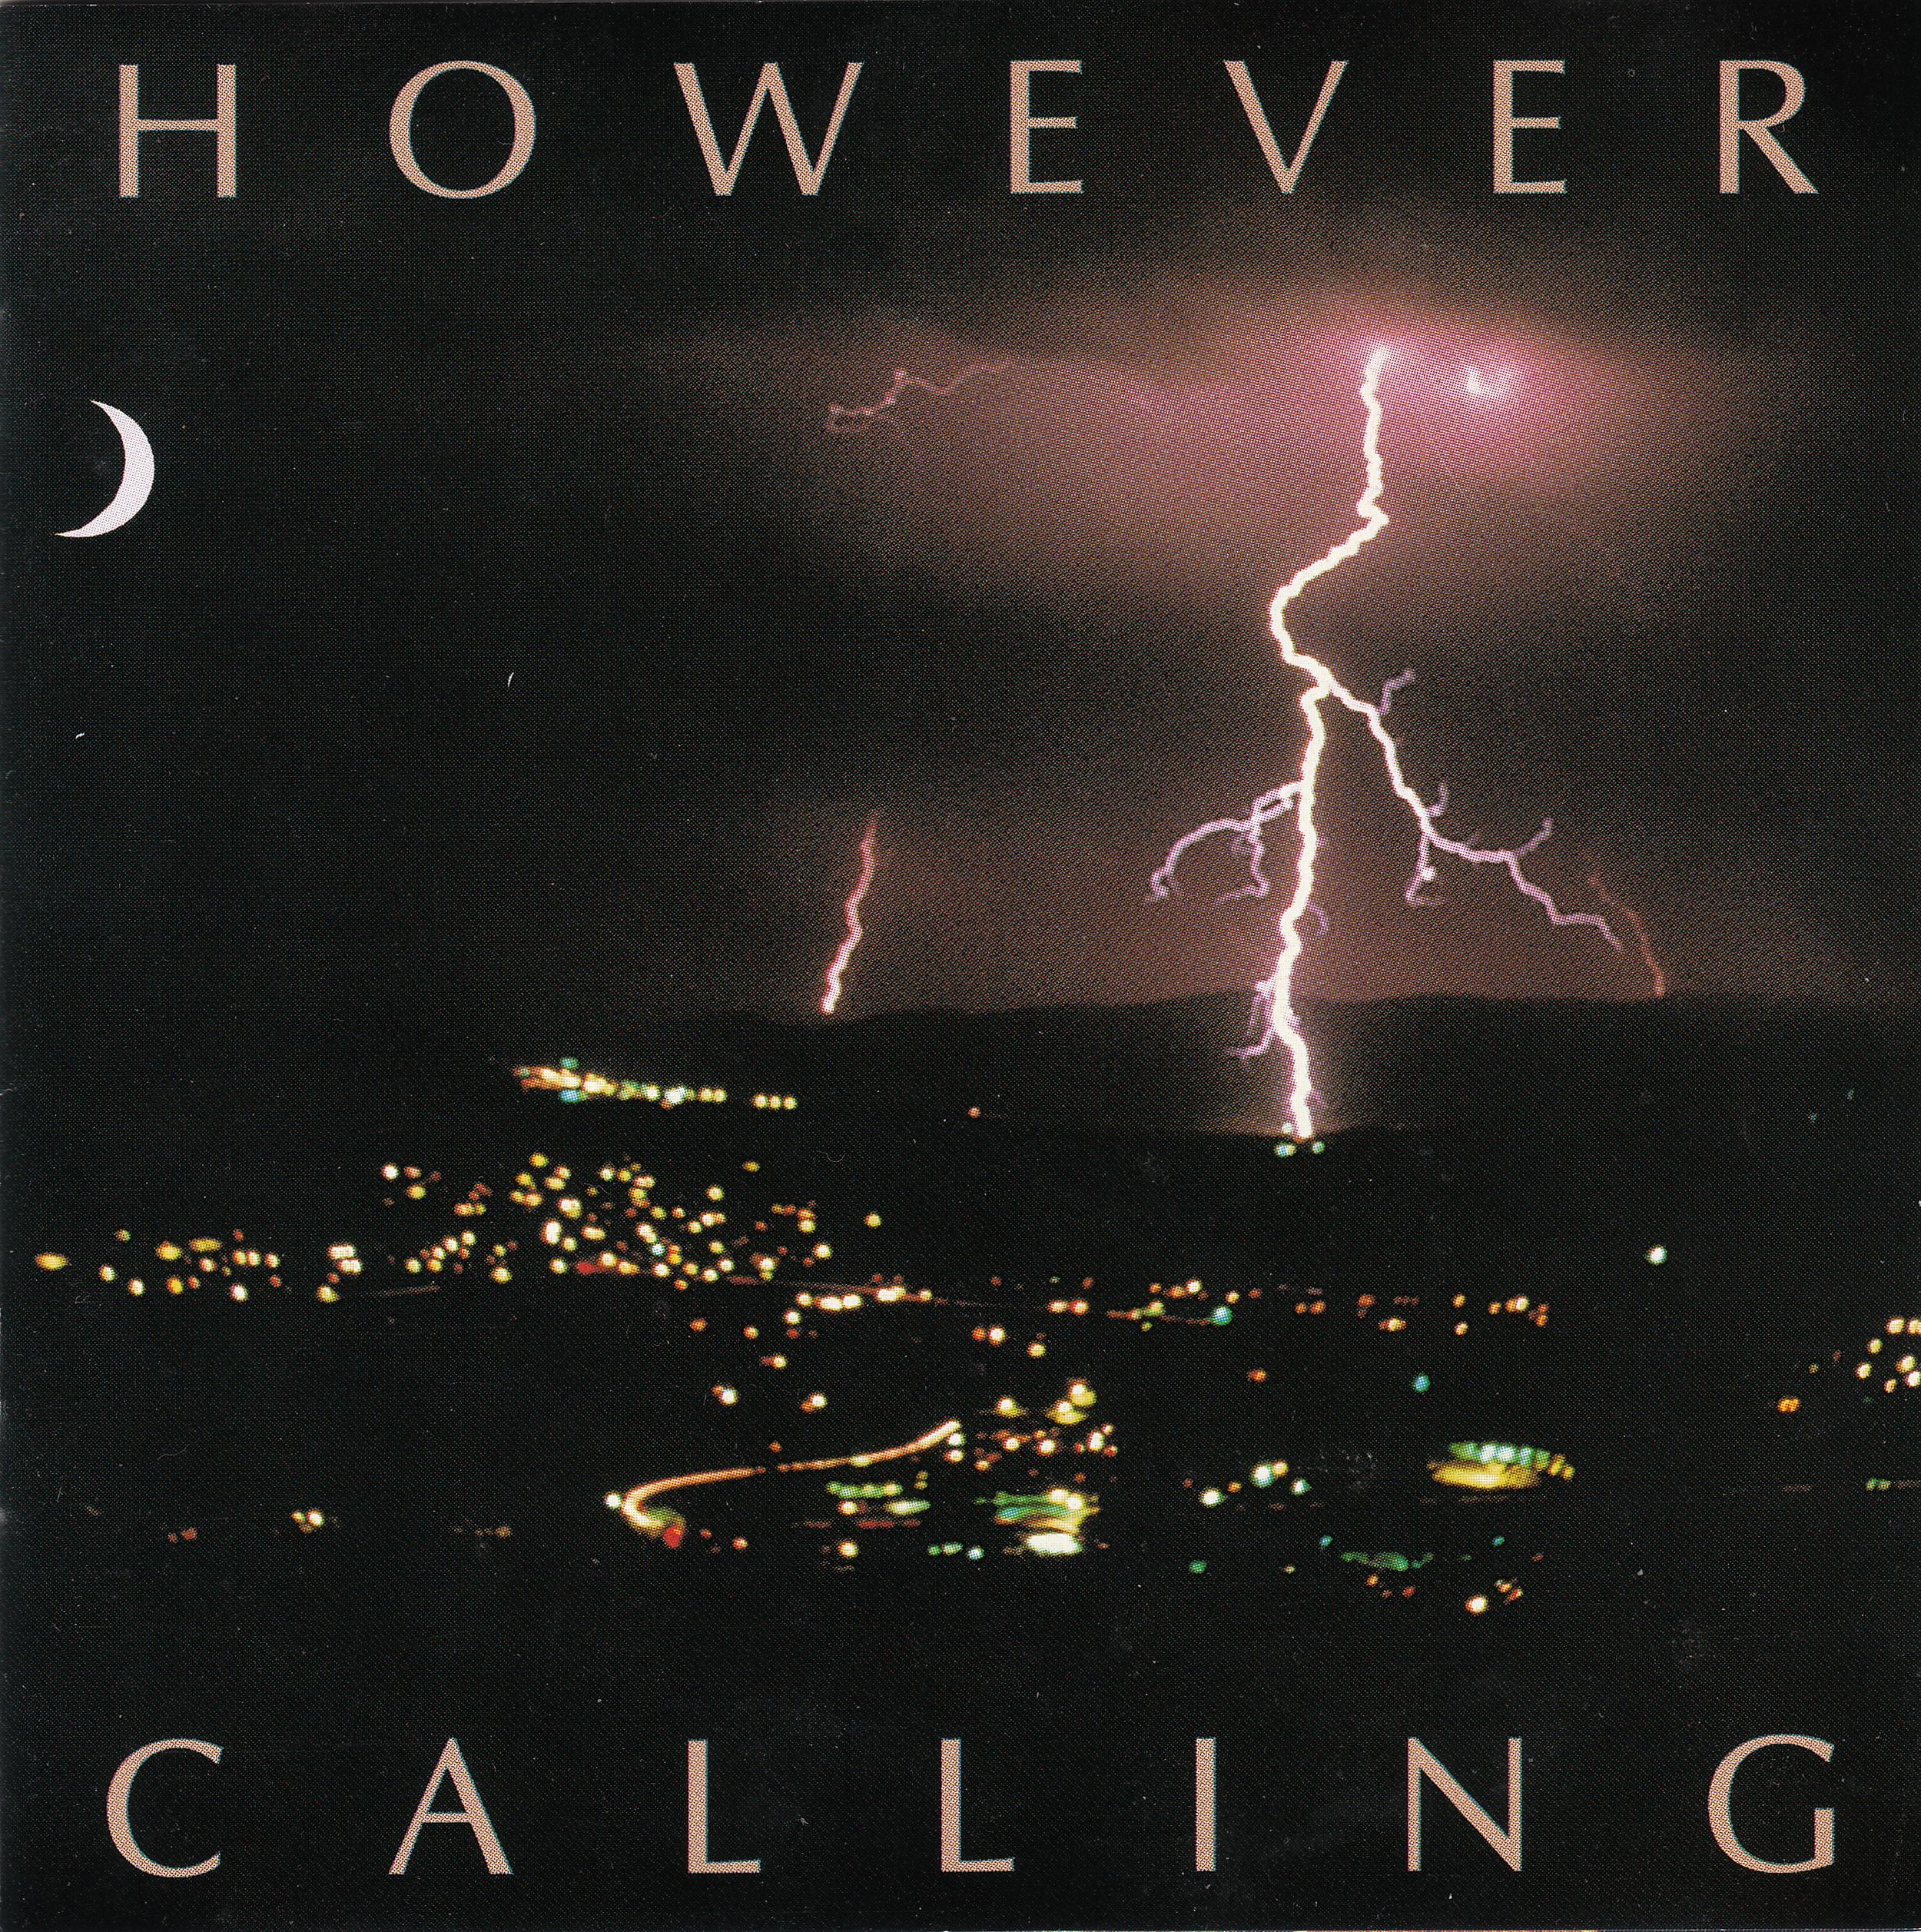 However - Calling